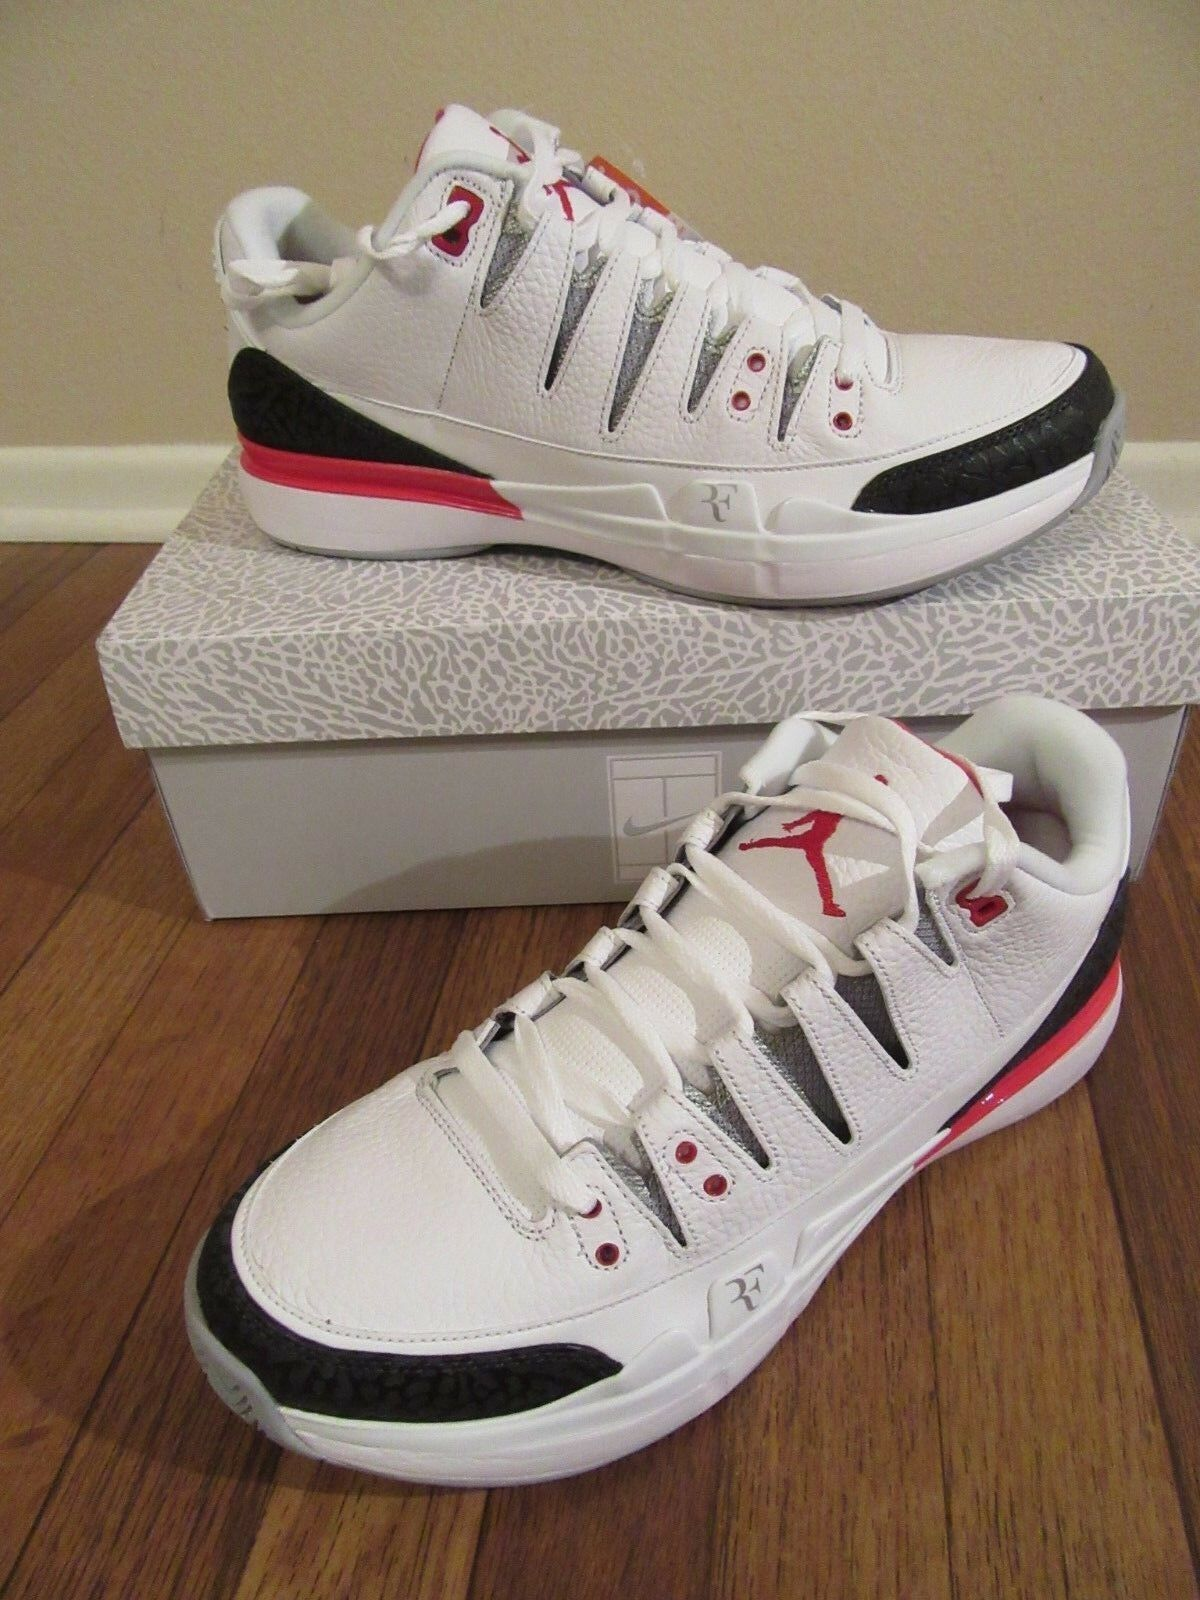 Nike - x aj3 zoom vapore taglia 12 jordan federer fuoco bianco rosso argento 709998 106